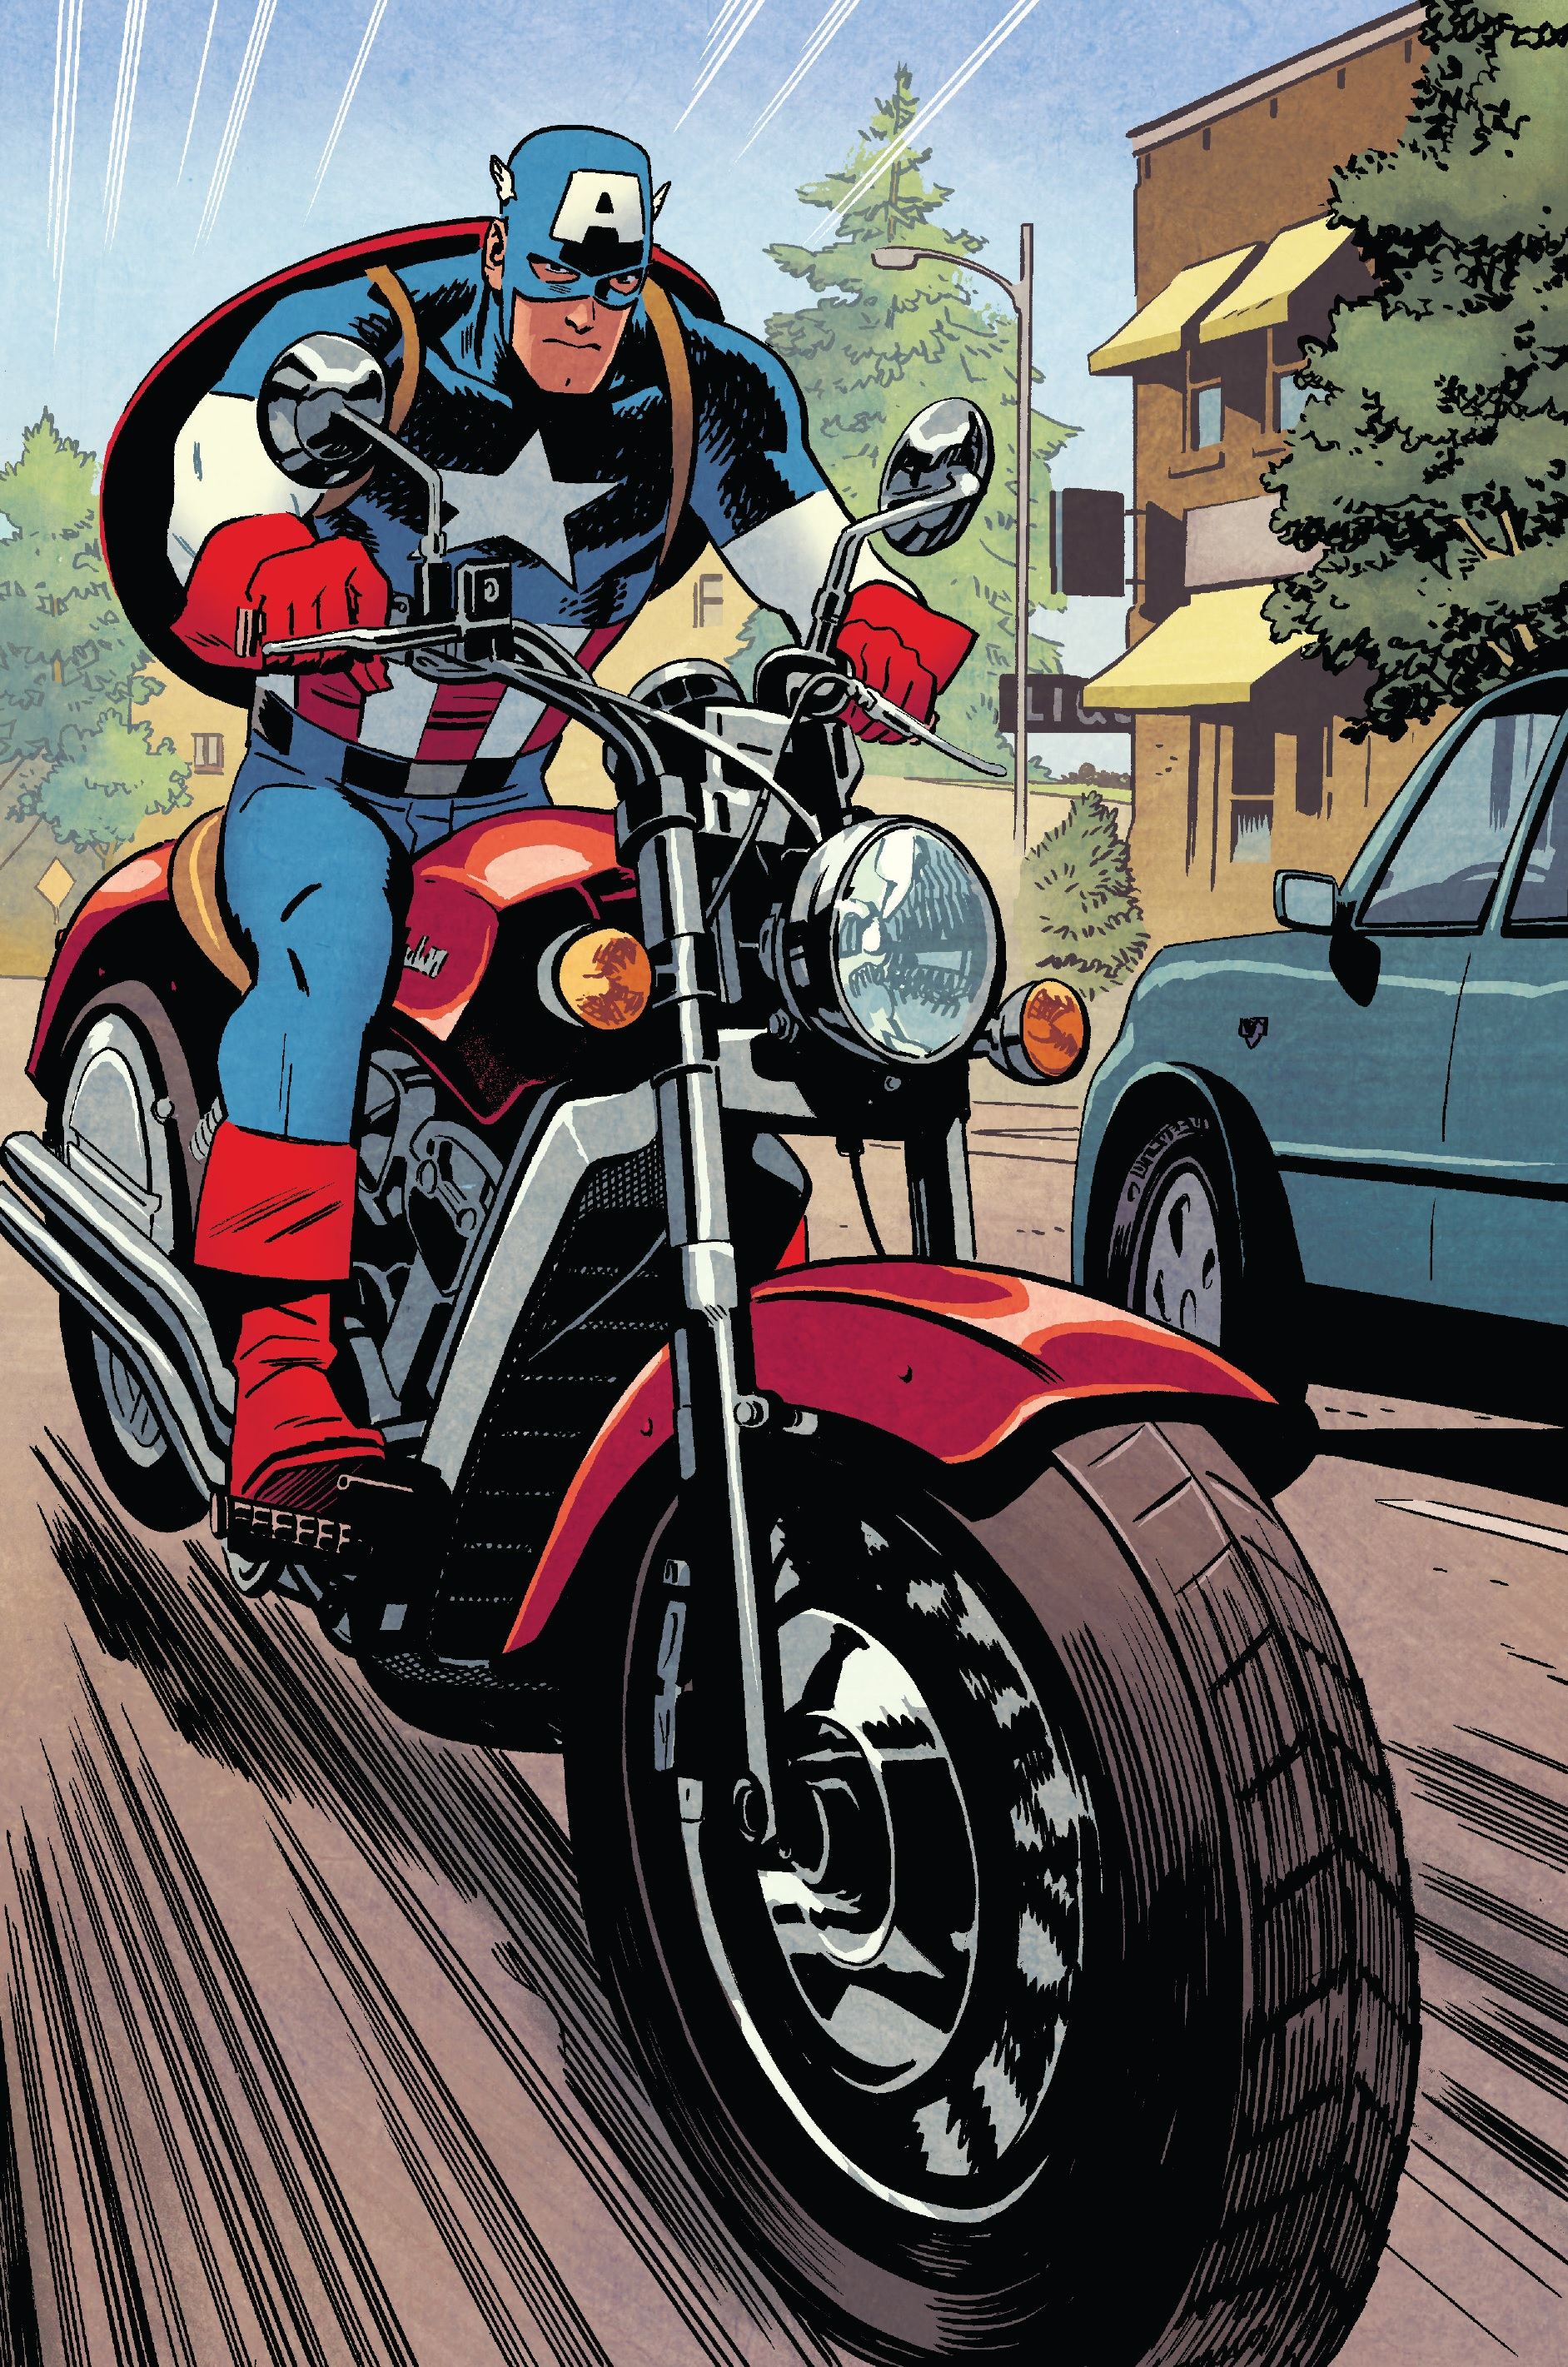 Motorbike Games - All Motorbike Games